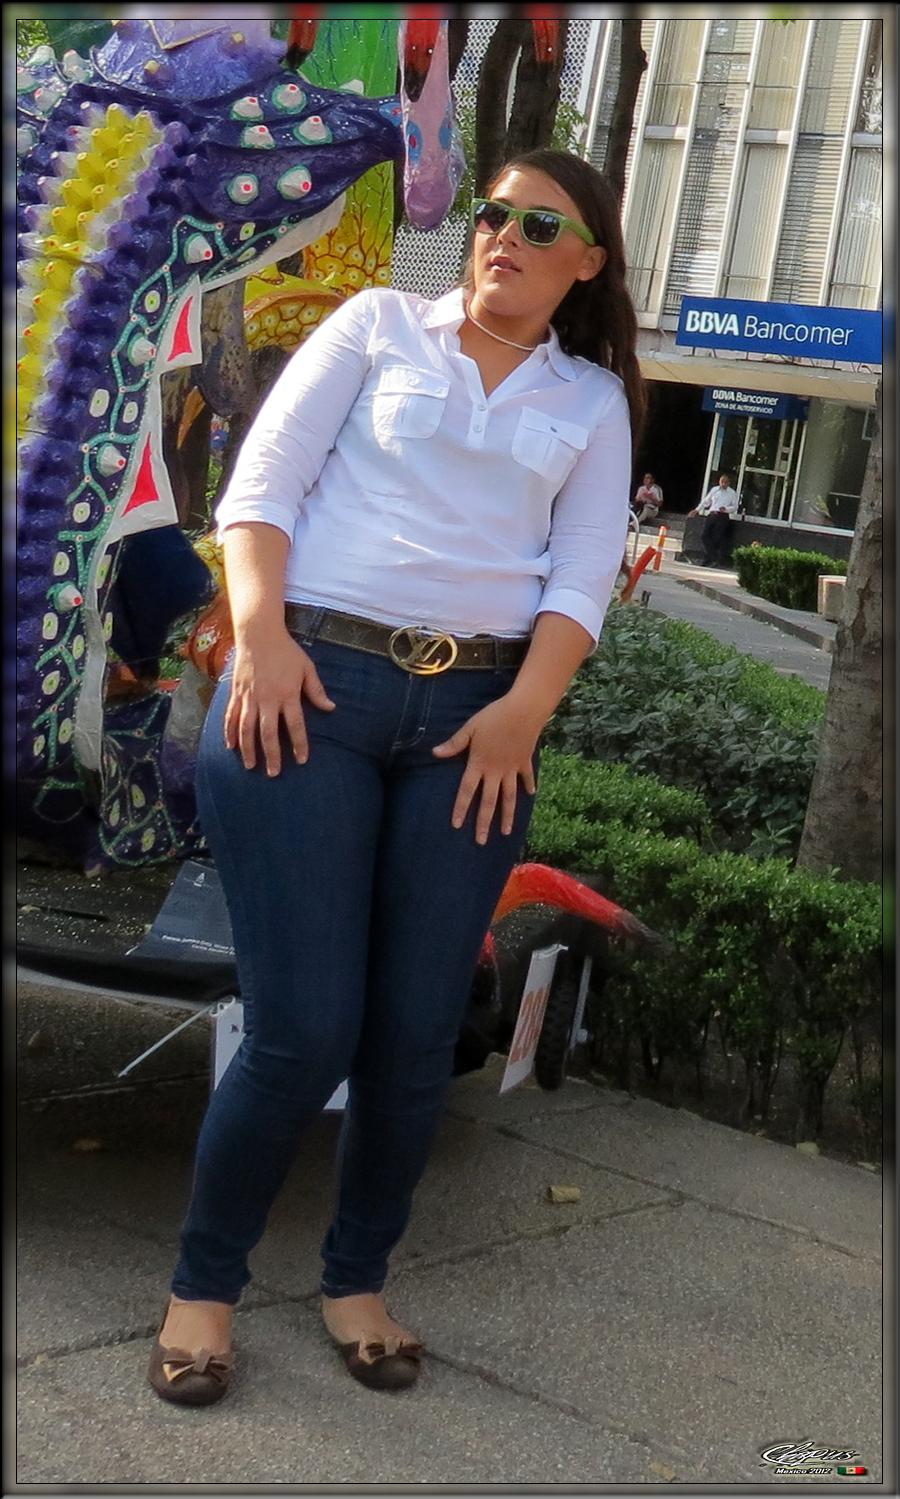 Chica nalgona en plaza de la tecnologiacutea - 1 2